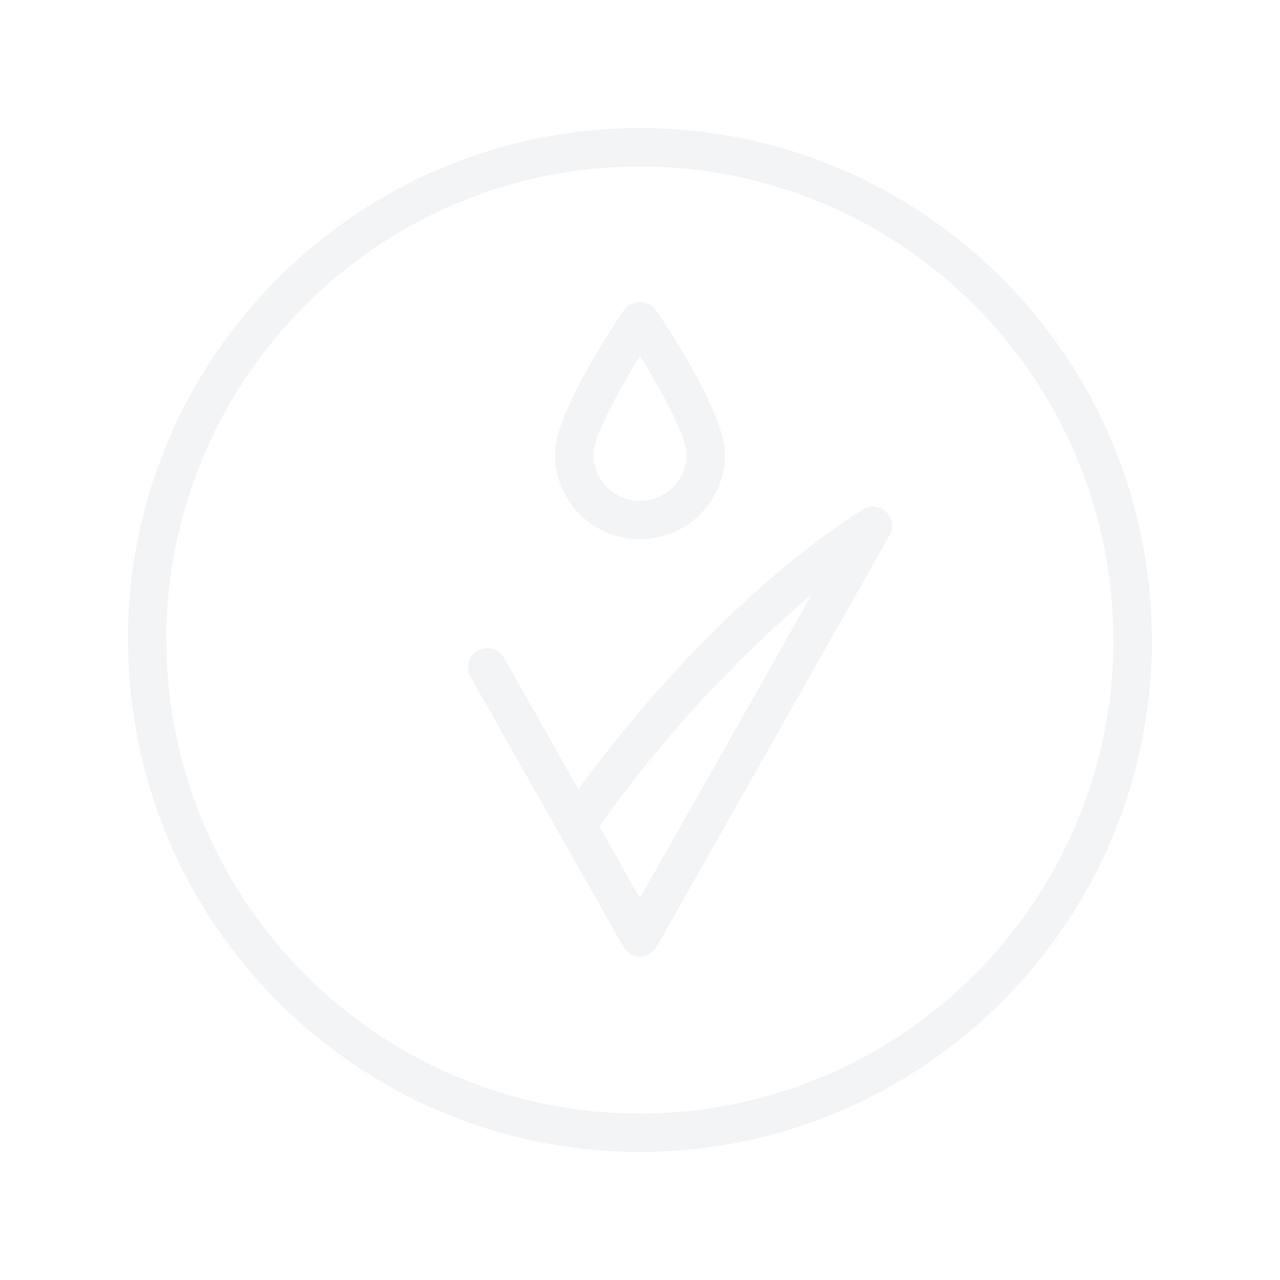 TINTS OF NATURE Henna Cream Golden Brown 70ml